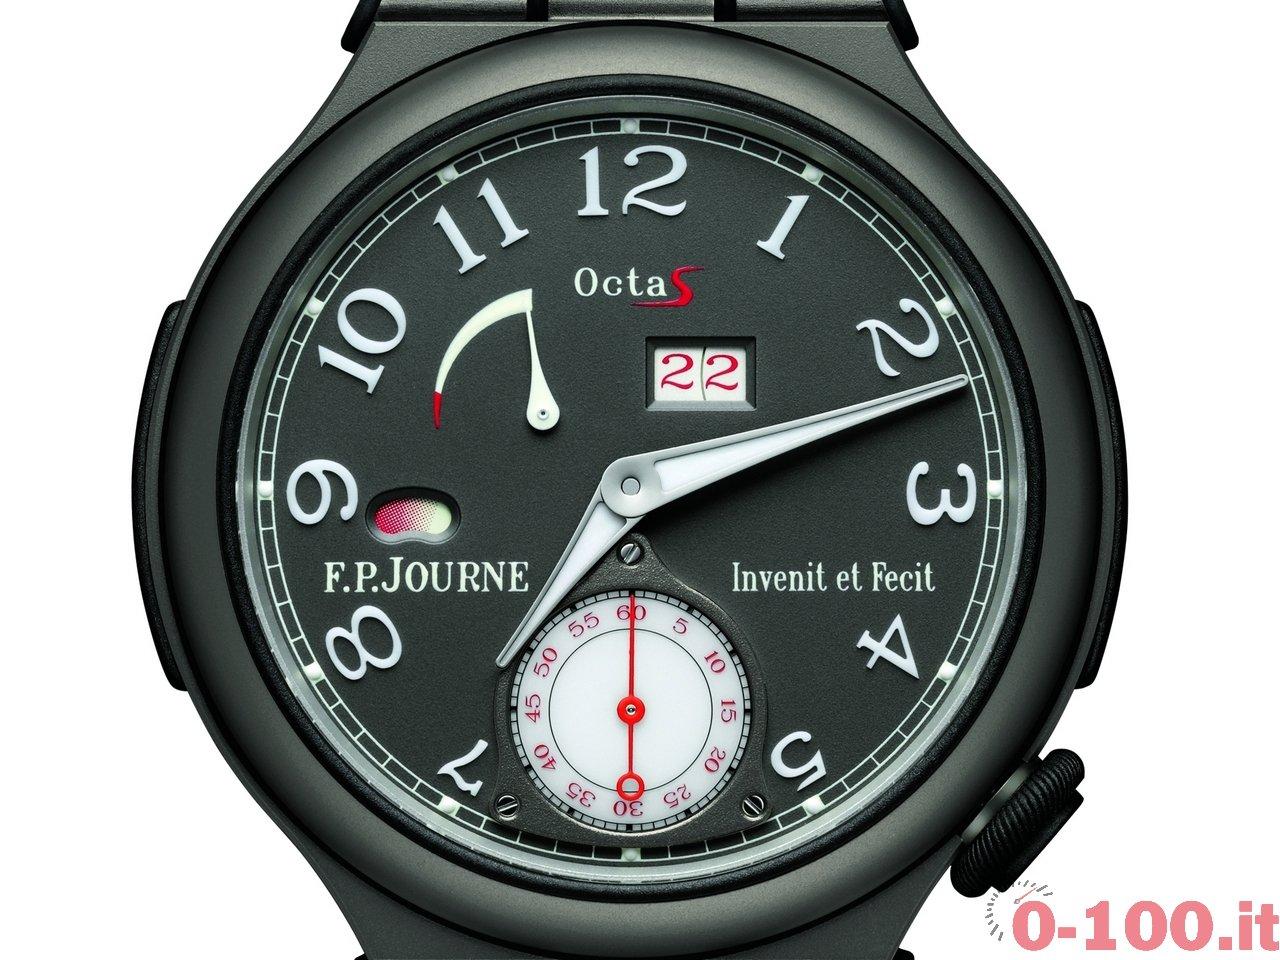 f-p-journe-octa-sport-titanium-prezzo-price-0-100_2